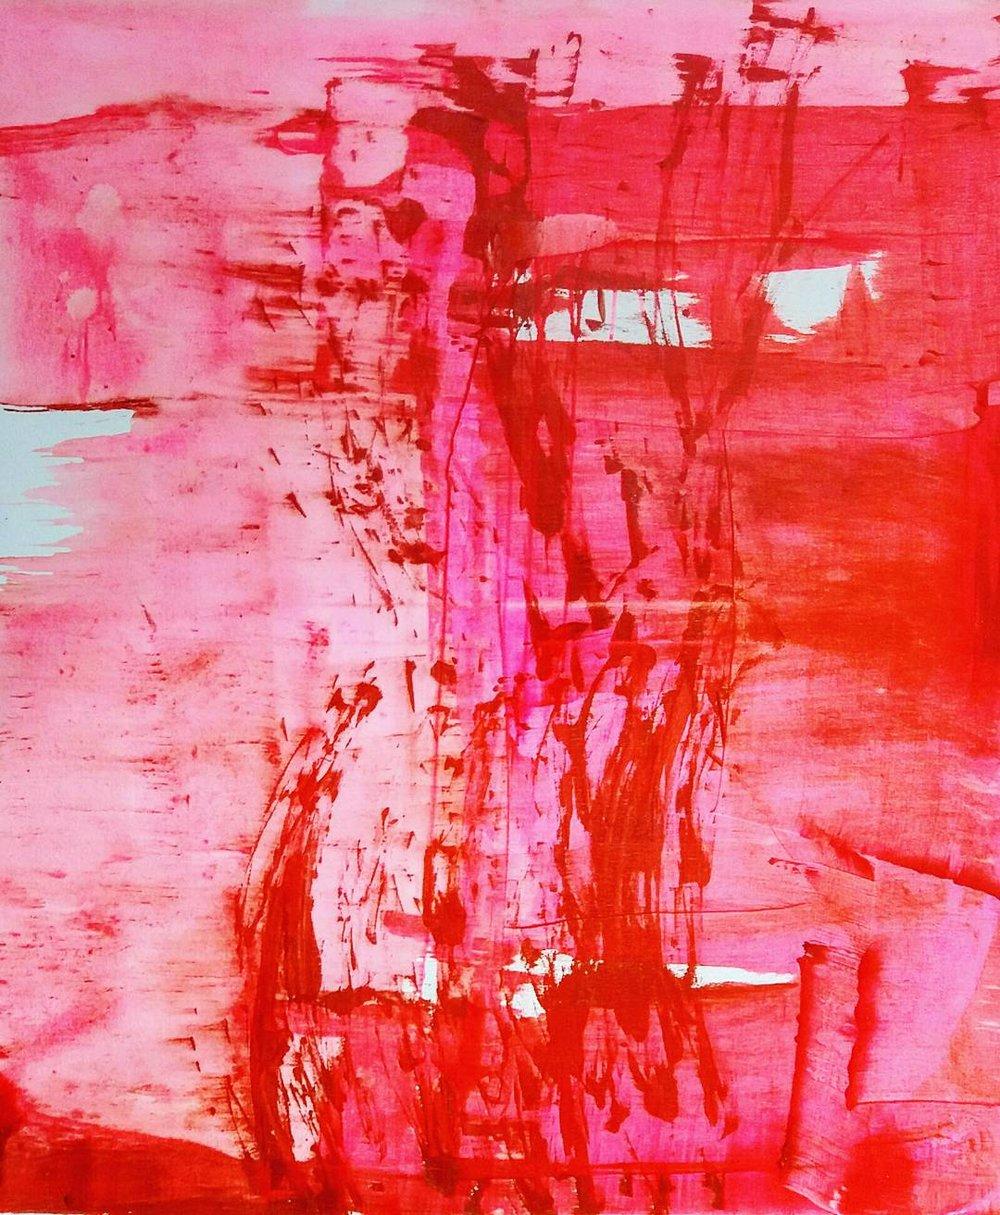 Magentakaislikko, Akryyli kankaalle, 100 cm x 120 cm  Myyty/ Sold